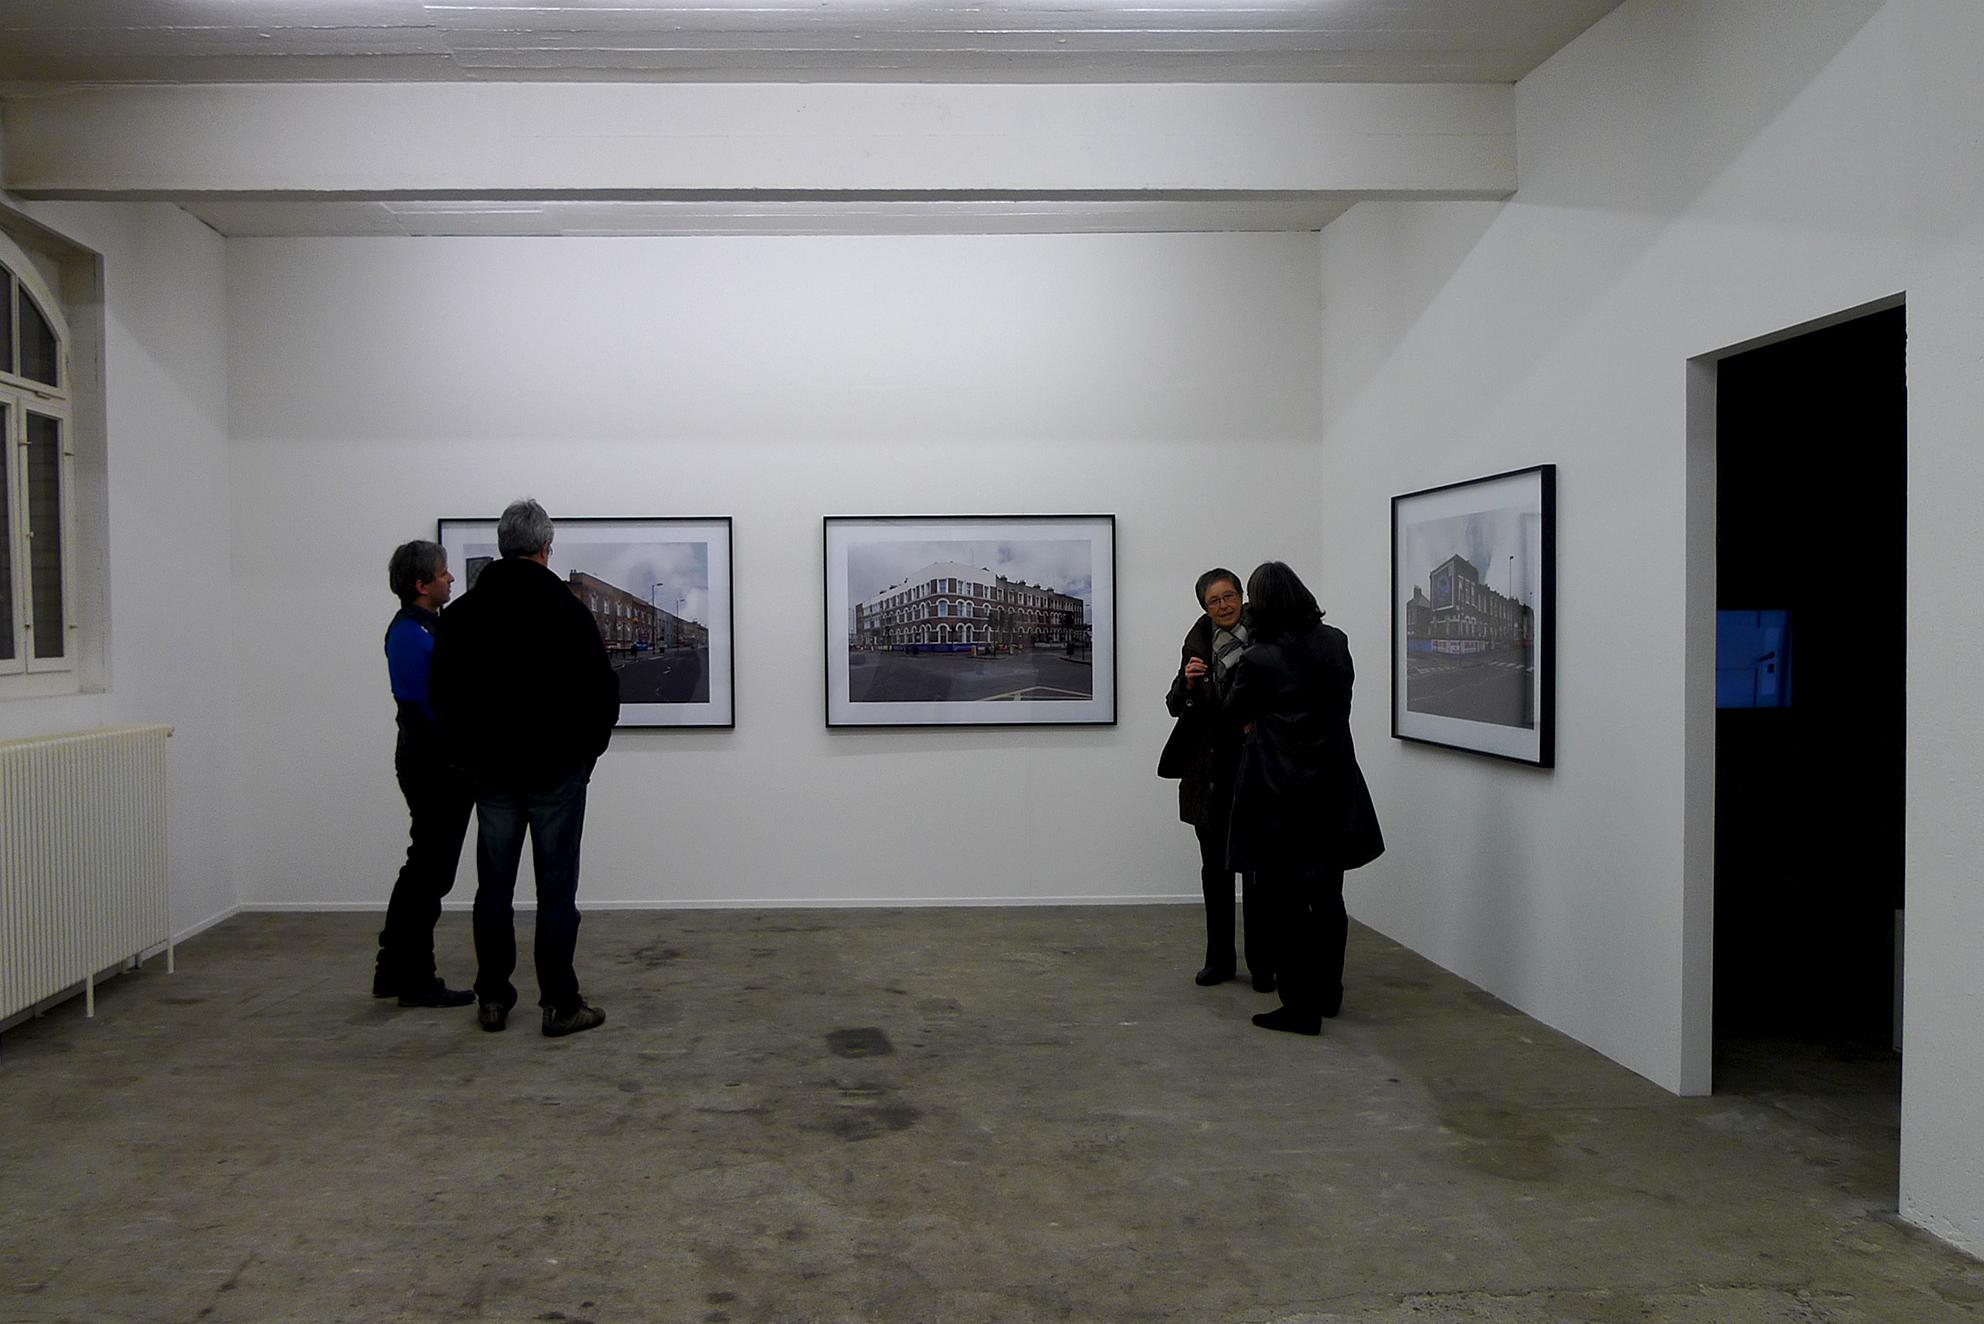 Finsbury, Blackstock Road, London, series of 3 photographs, inkjet print / black wooden frame and glass, 104 x 150 x 4 cm, 2011